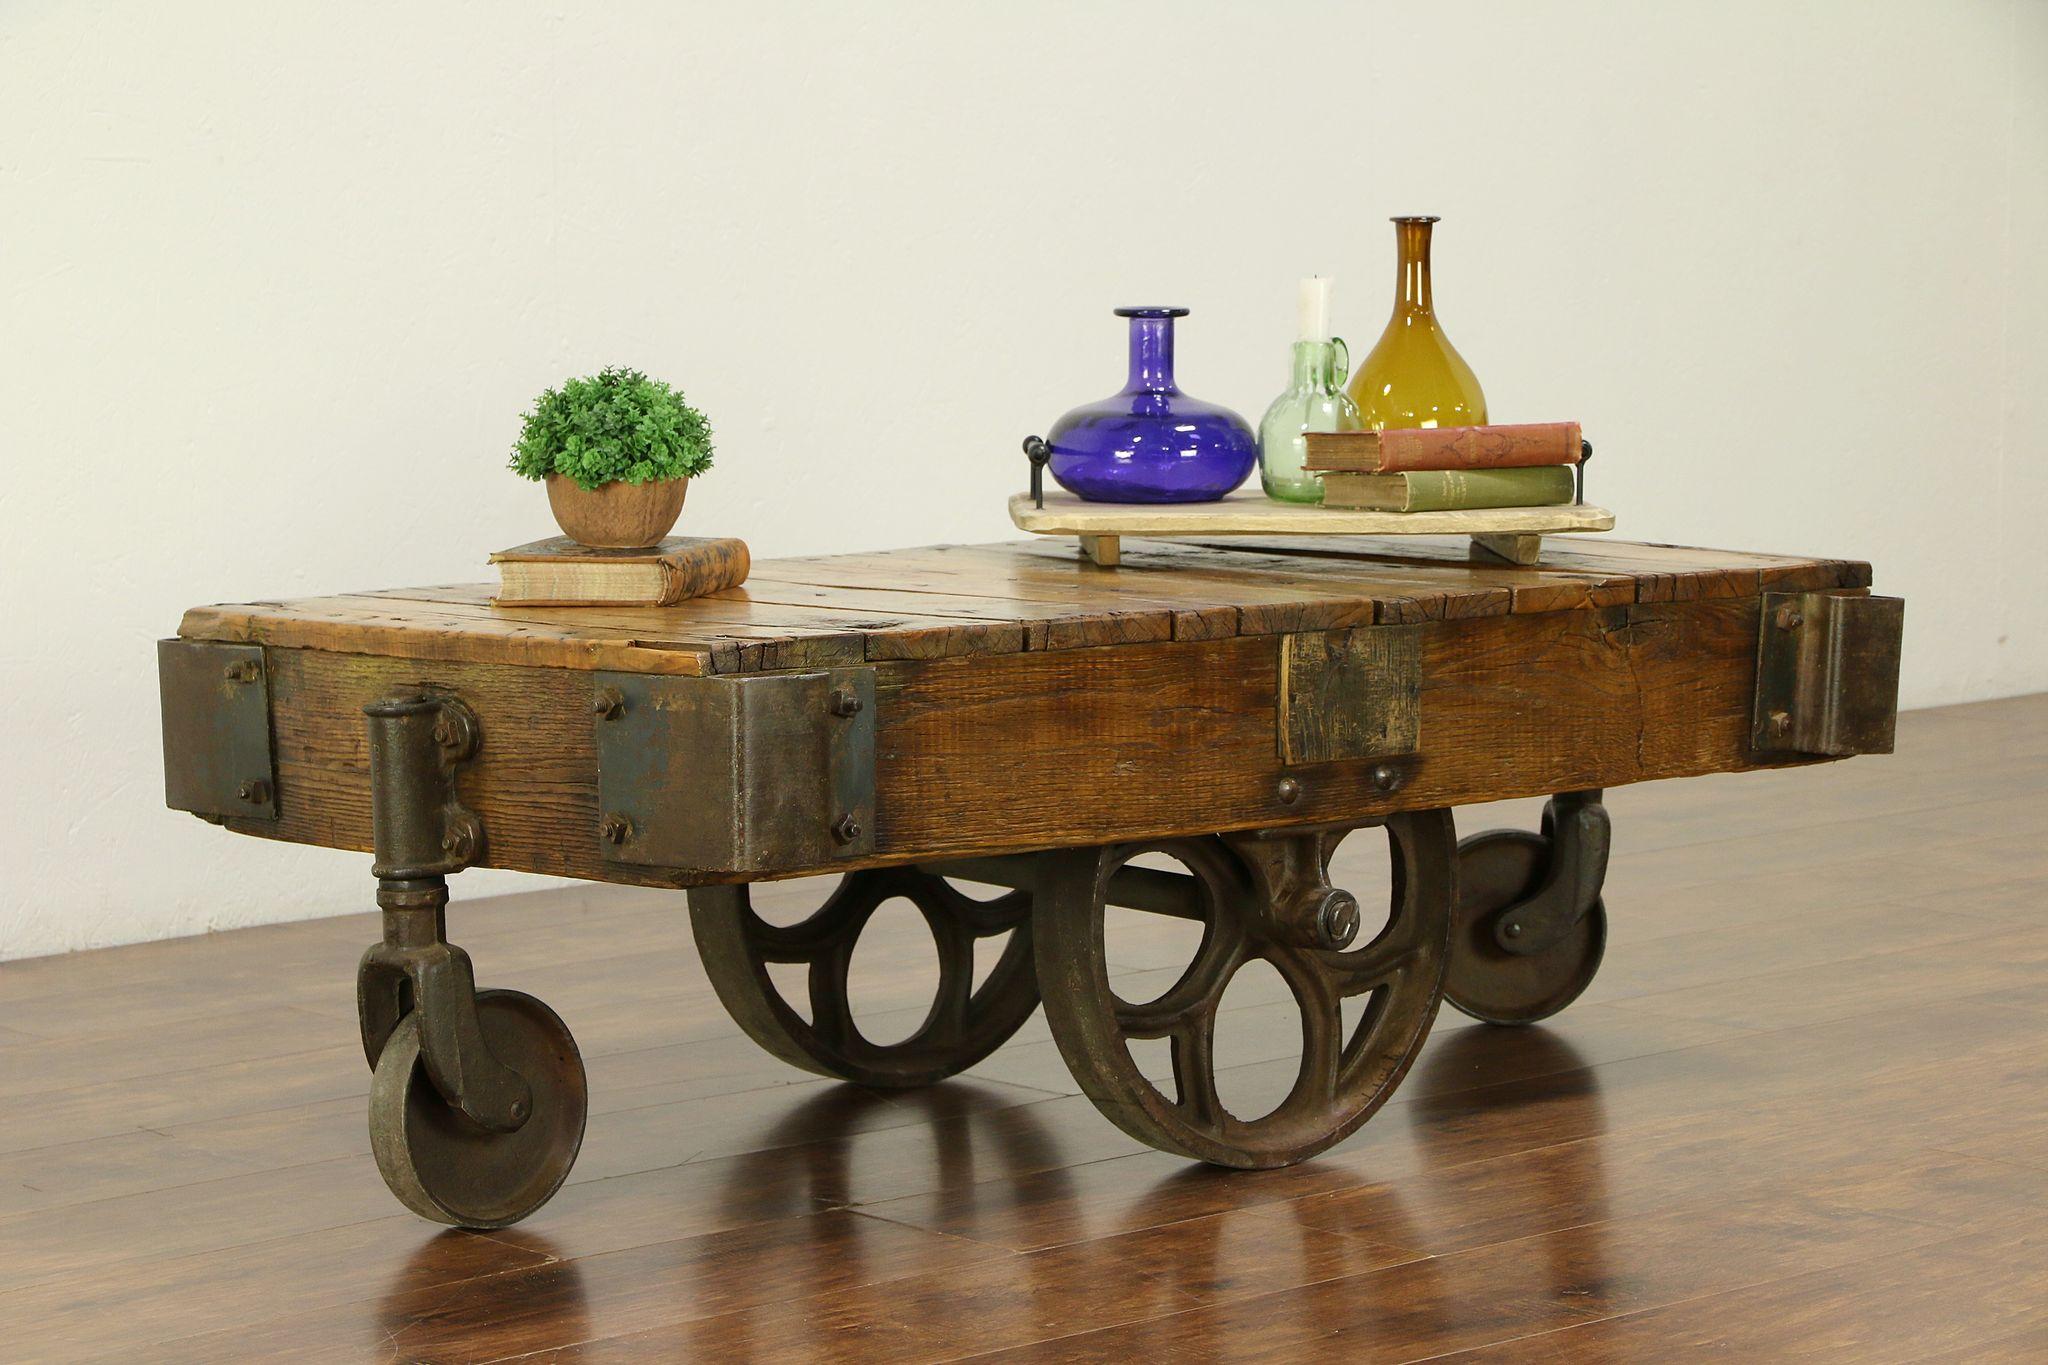 Terrific Industrial Antique Factory Salvage Railroad Cart Or Coffee Table 30535 Interior Design Ideas Tzicisoteloinfo